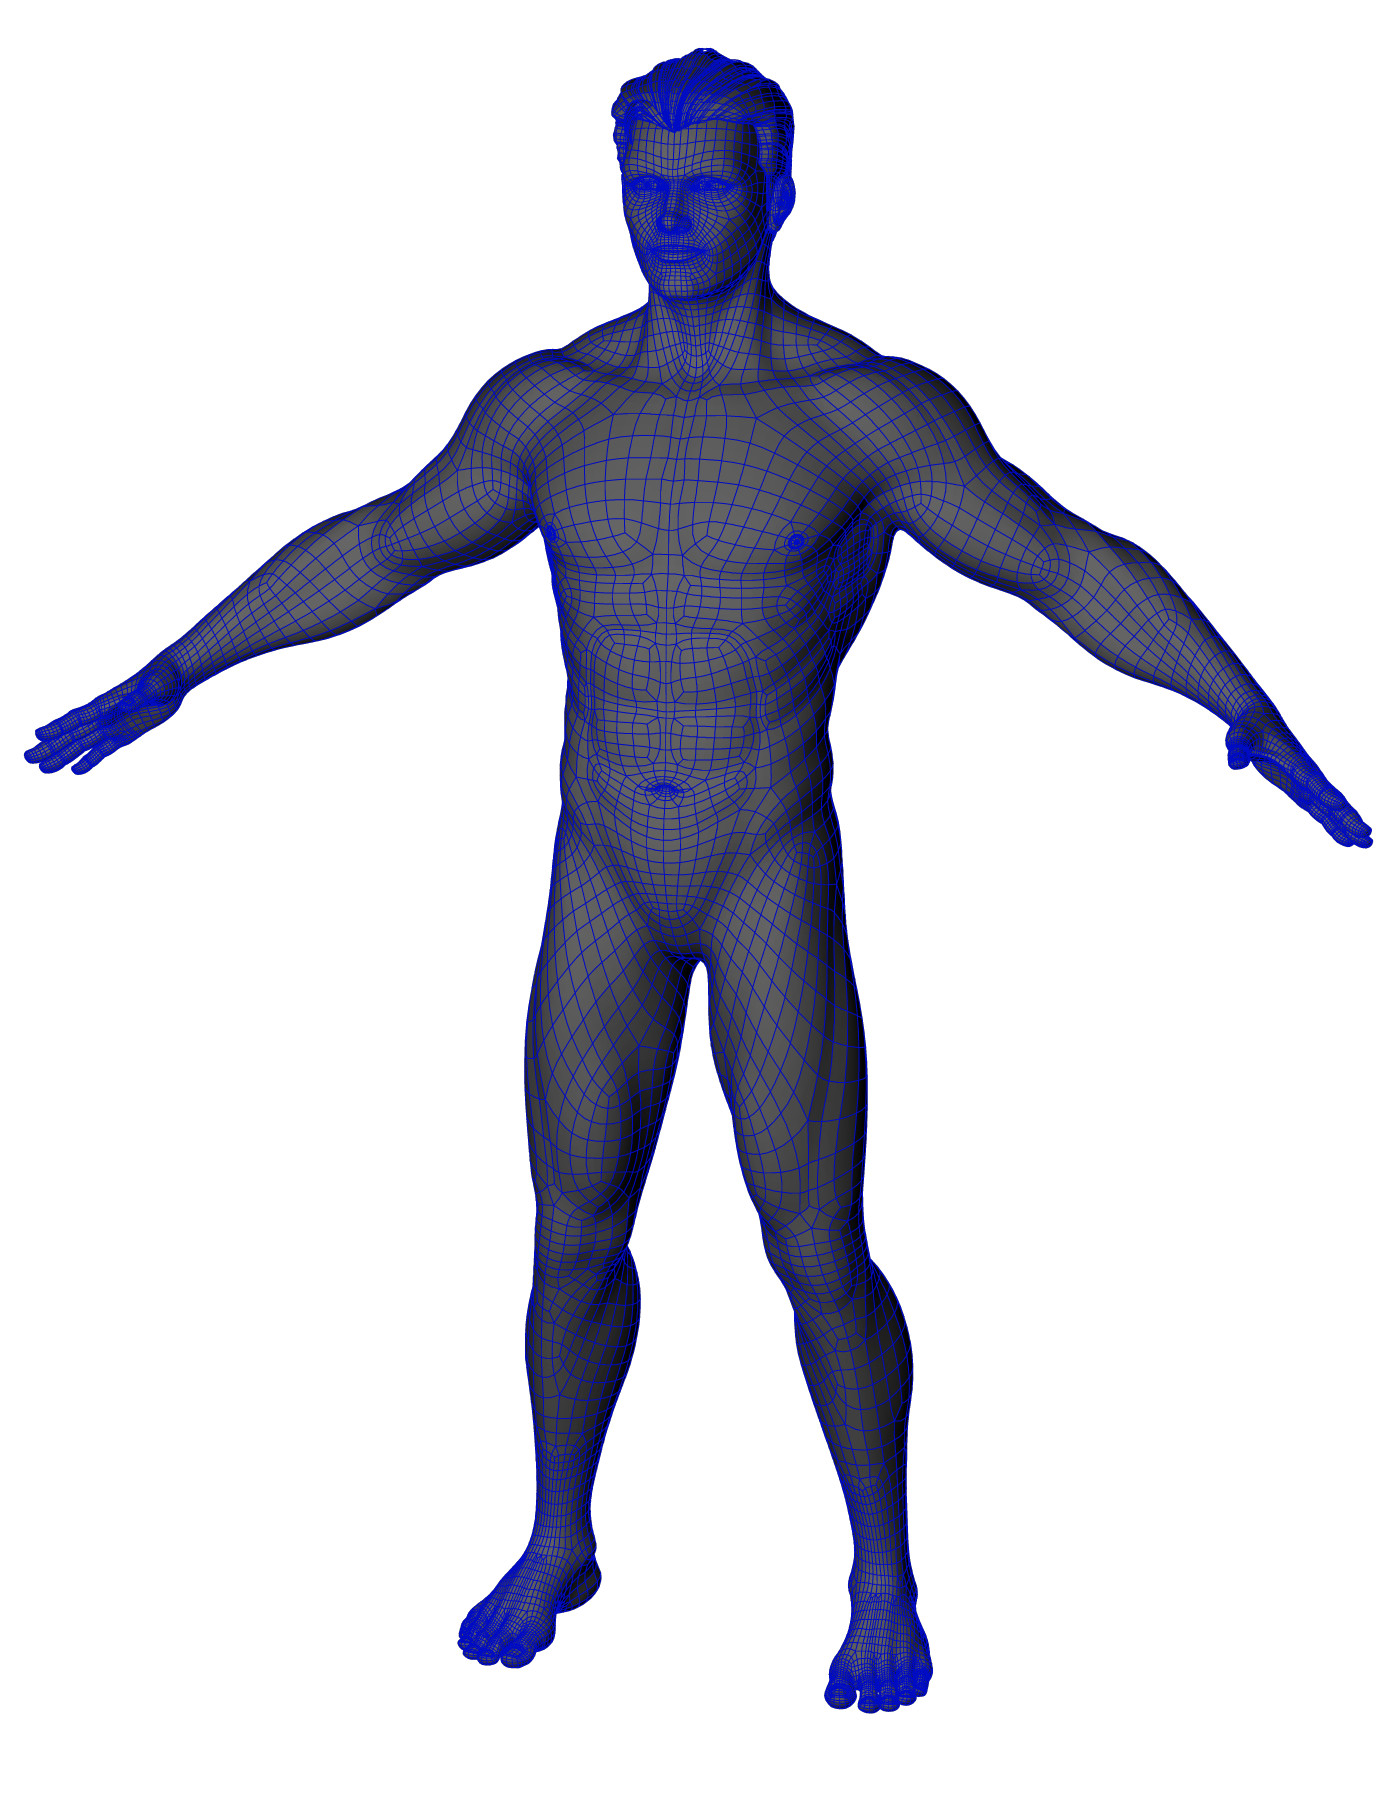 Stalin M Human Anatomy Male